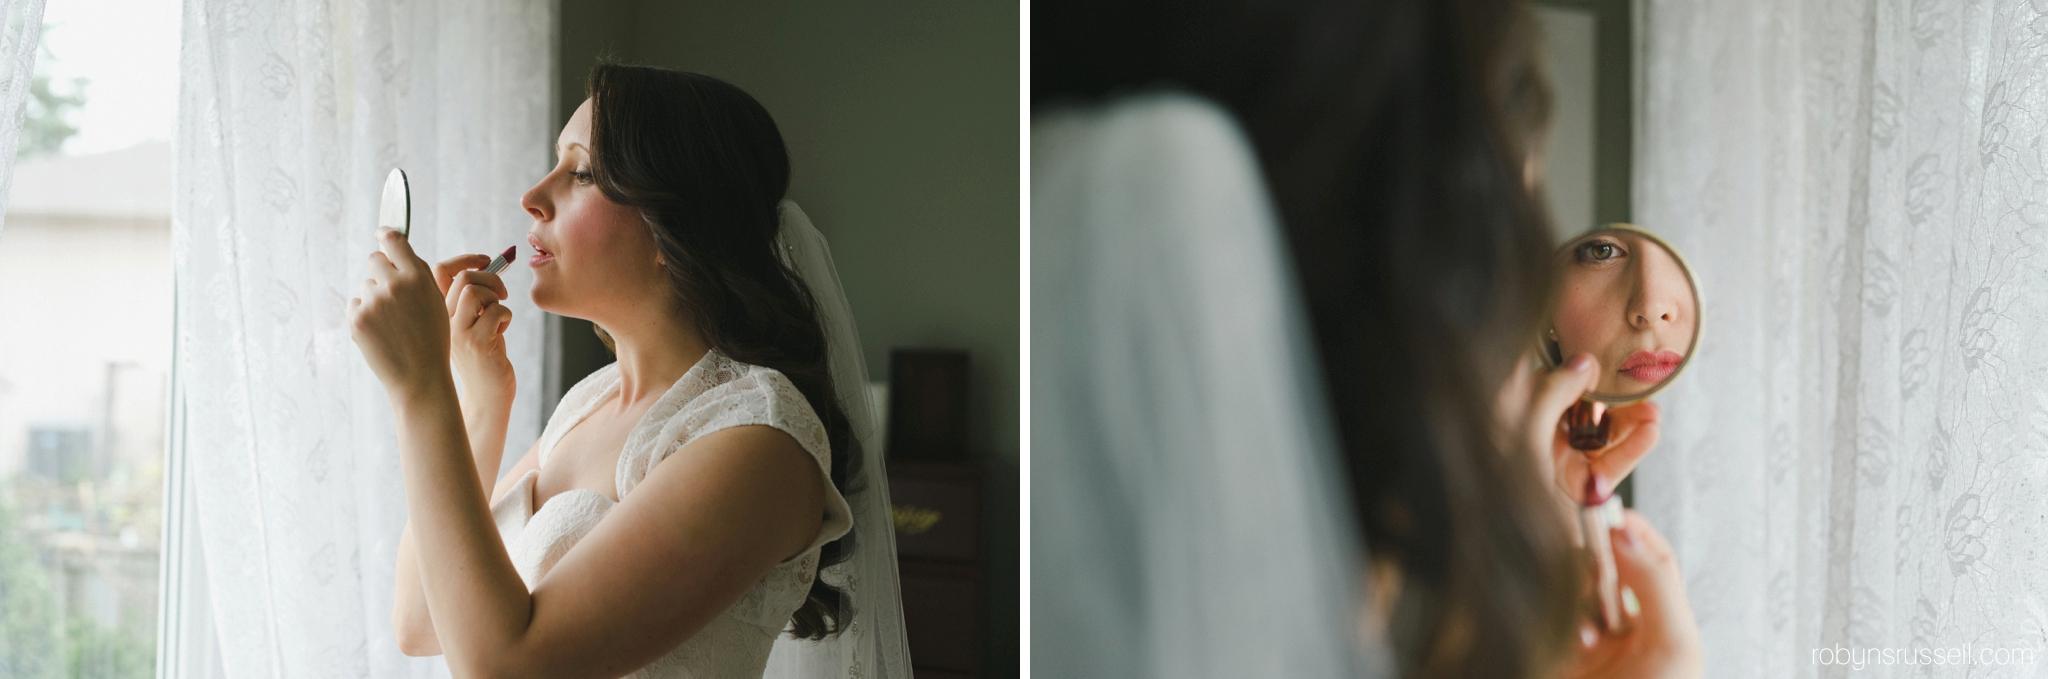 10-bride-putting-on-lipstick-oakville-wedding-photograhper.jpg